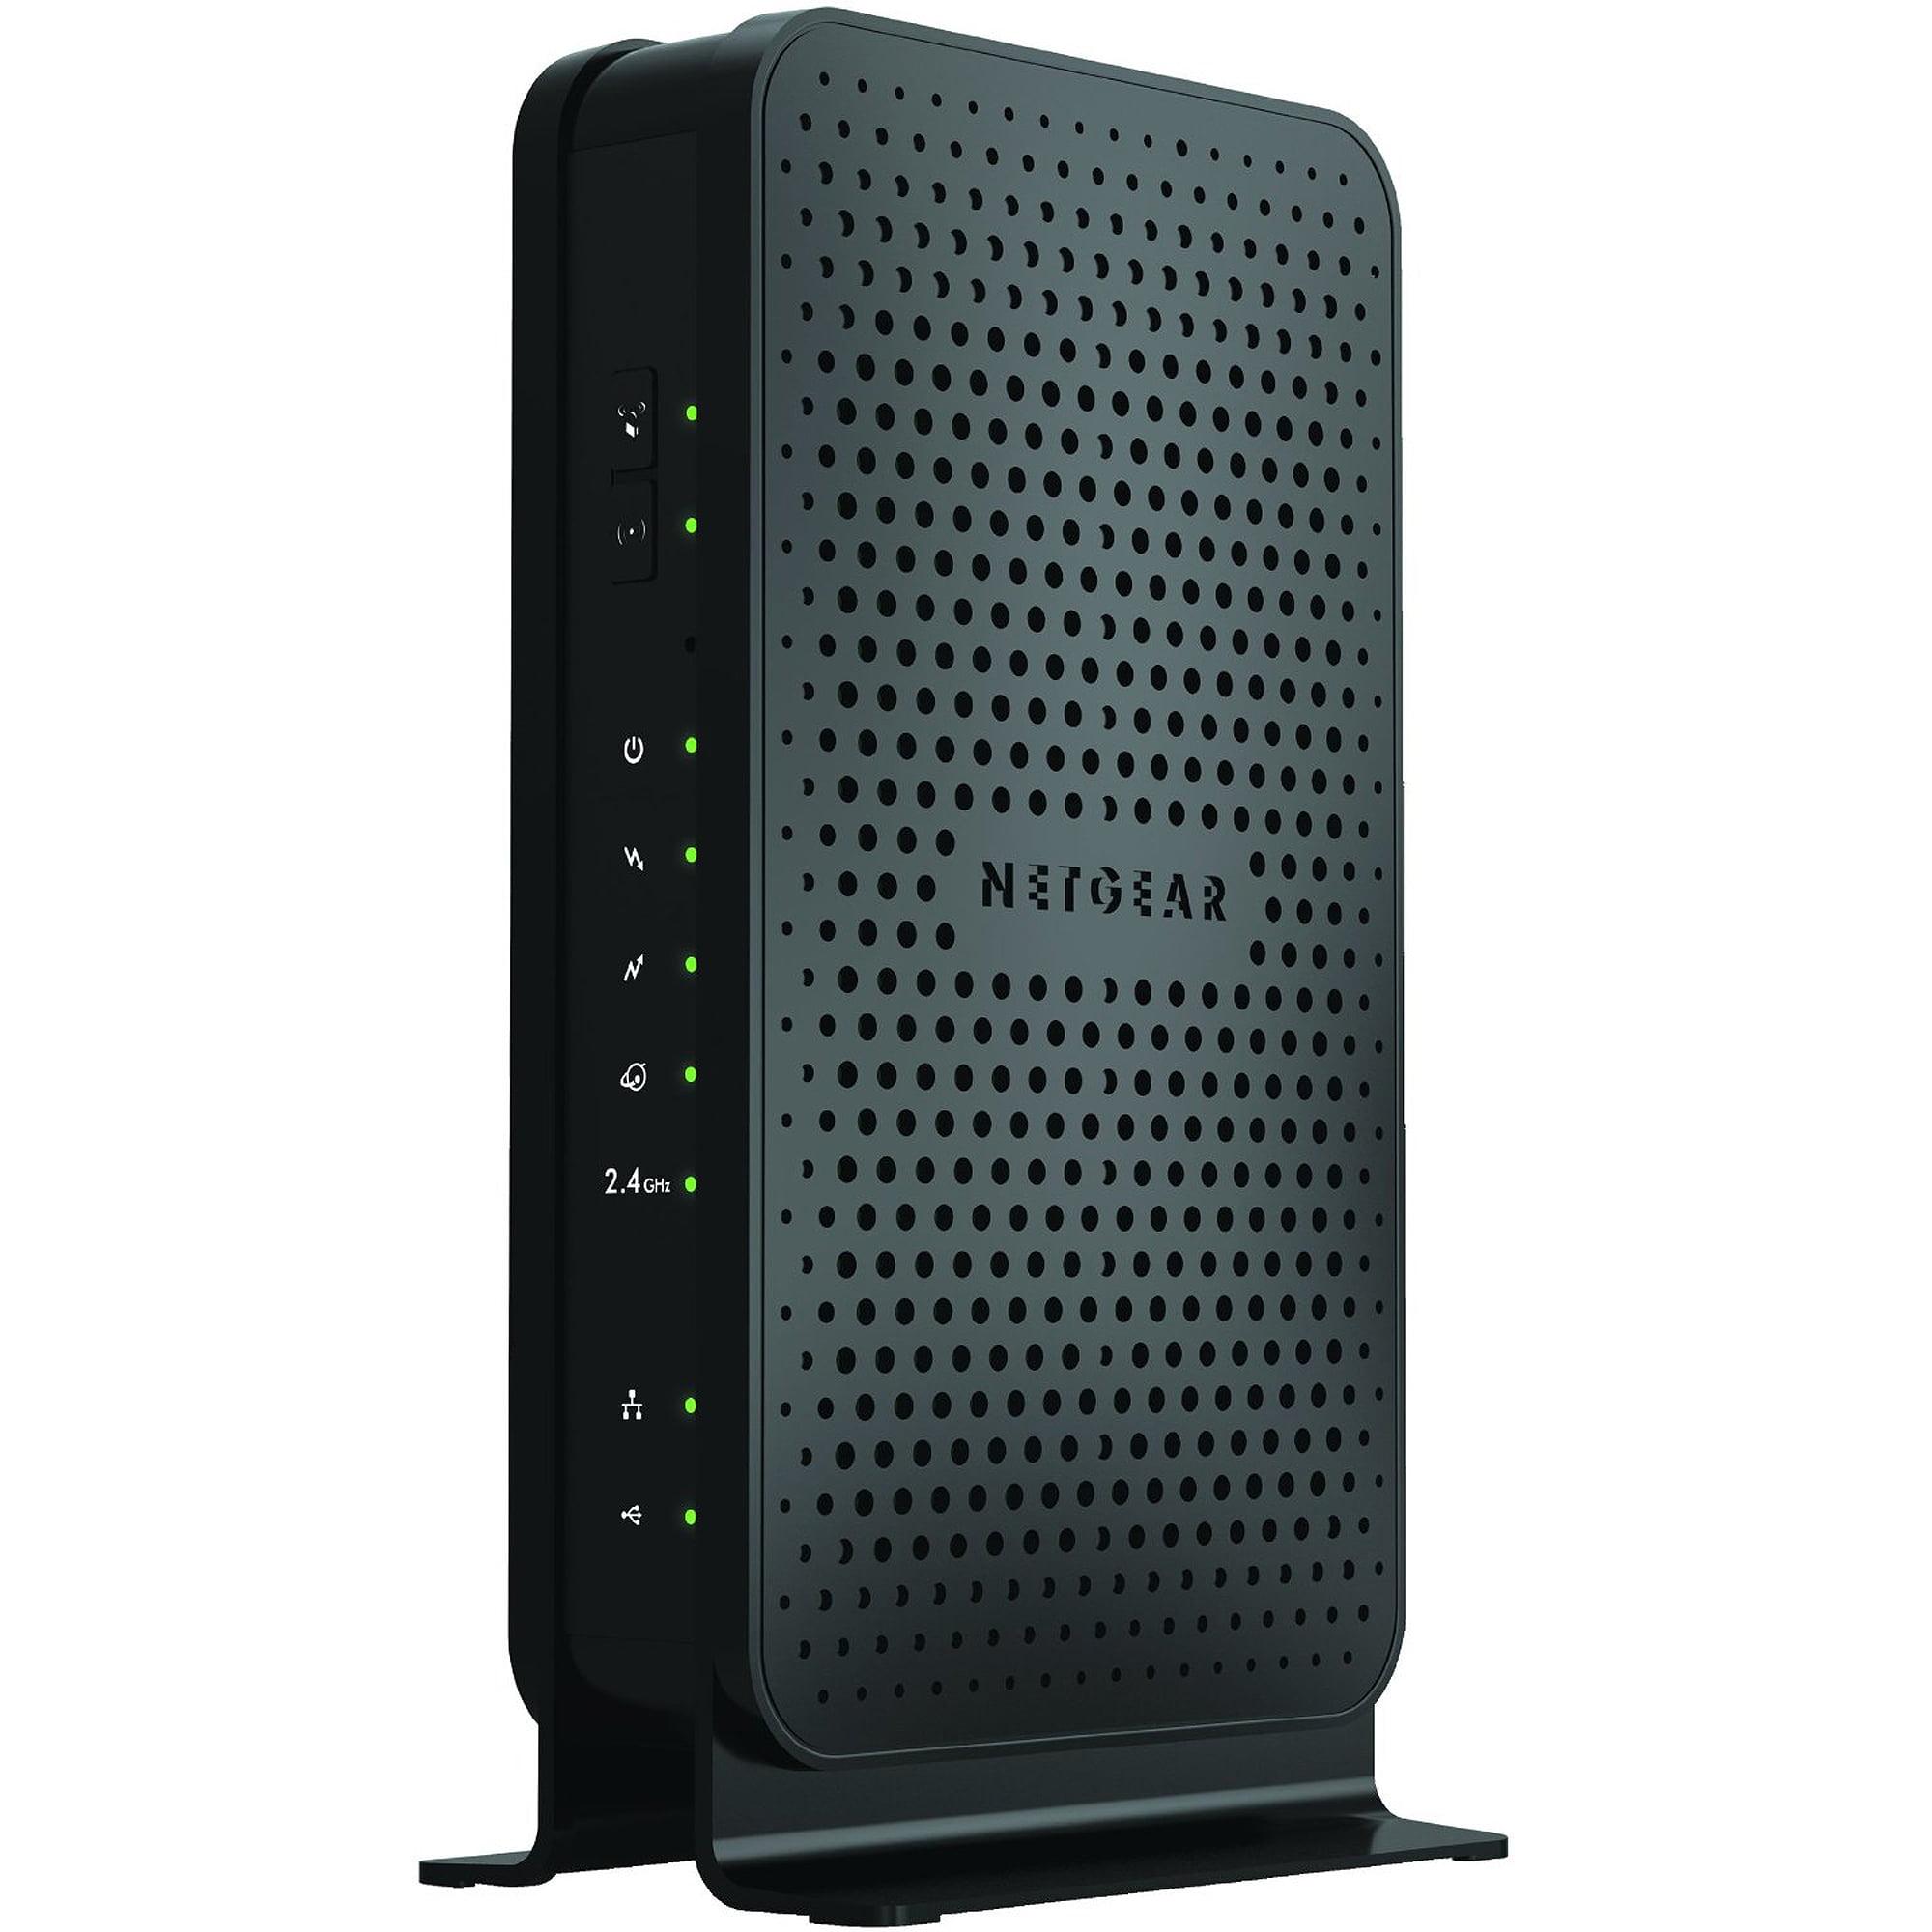 NETGEAR N300 WiFi DOCSIS 3.0 Cable Modem Router